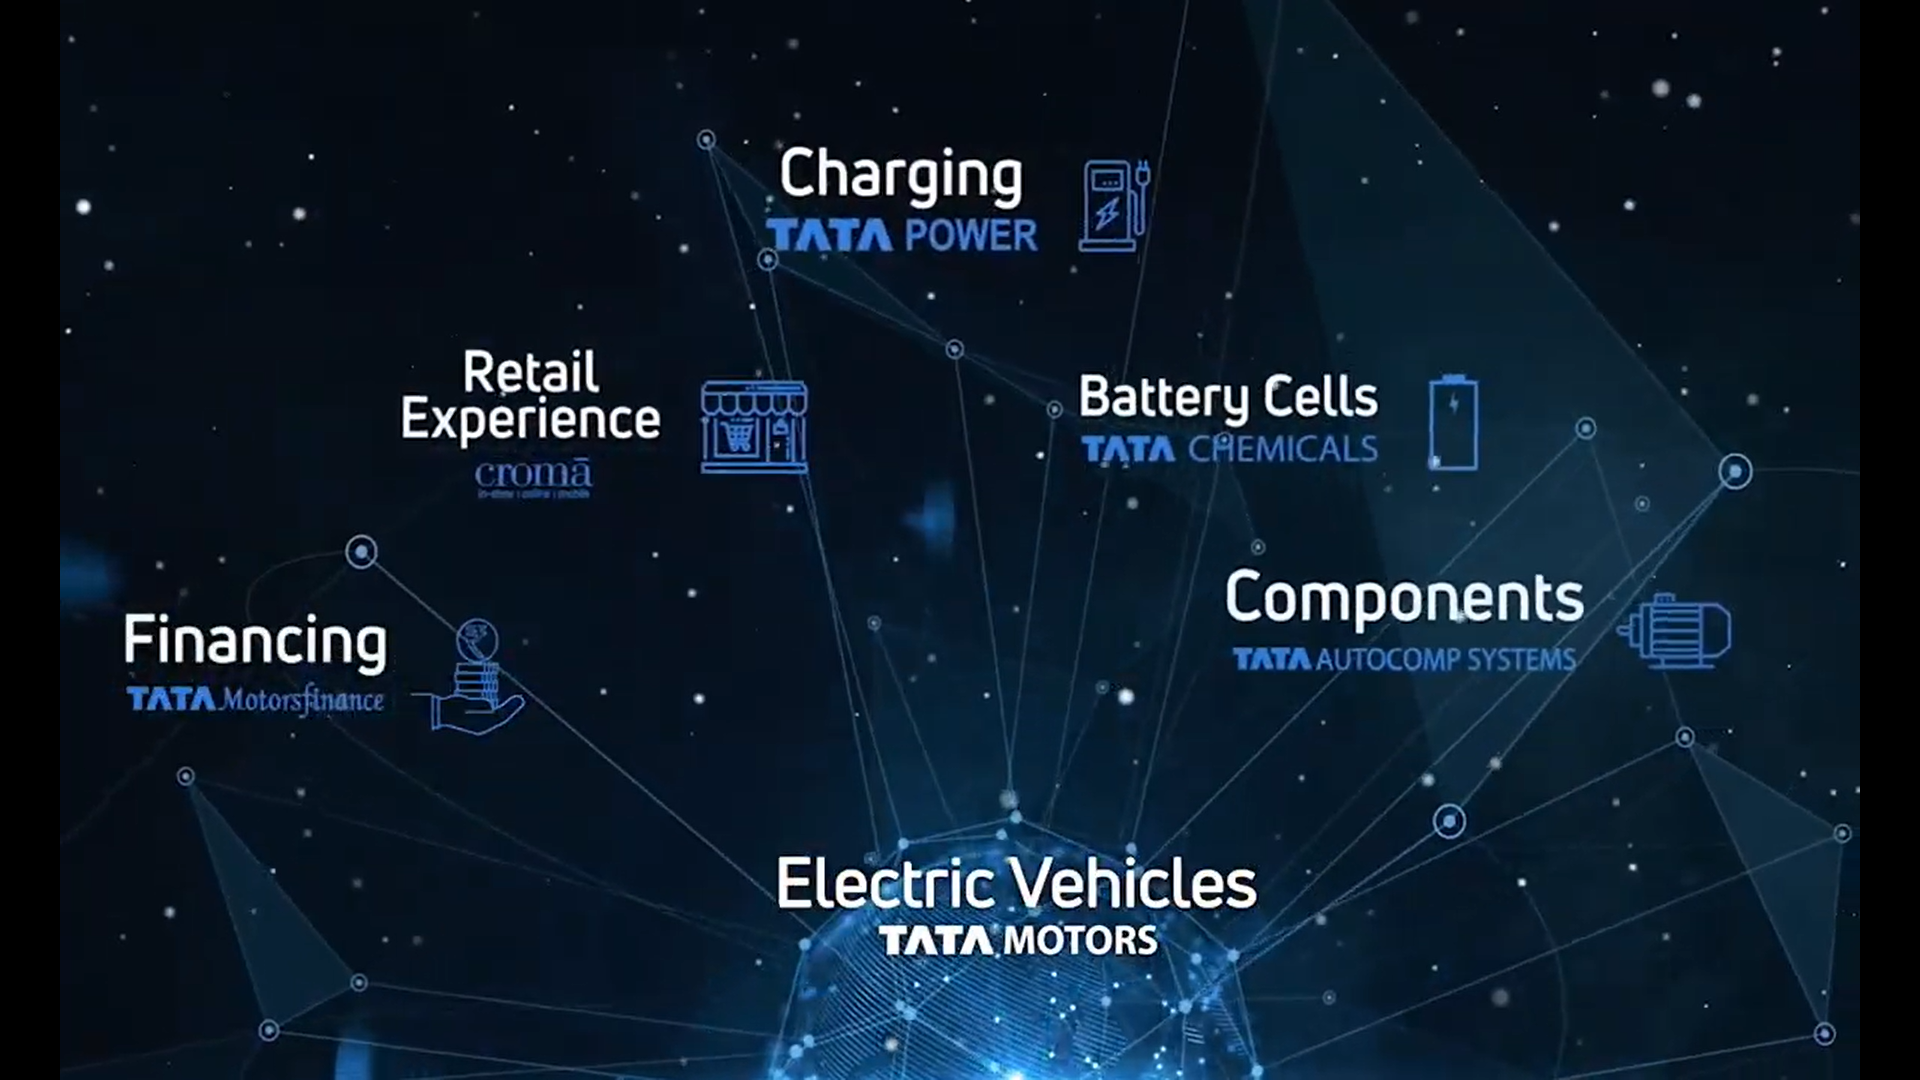 ETAuto Original: How Tata Motors wins the EV game in spite of Mahindra's decade-old head start